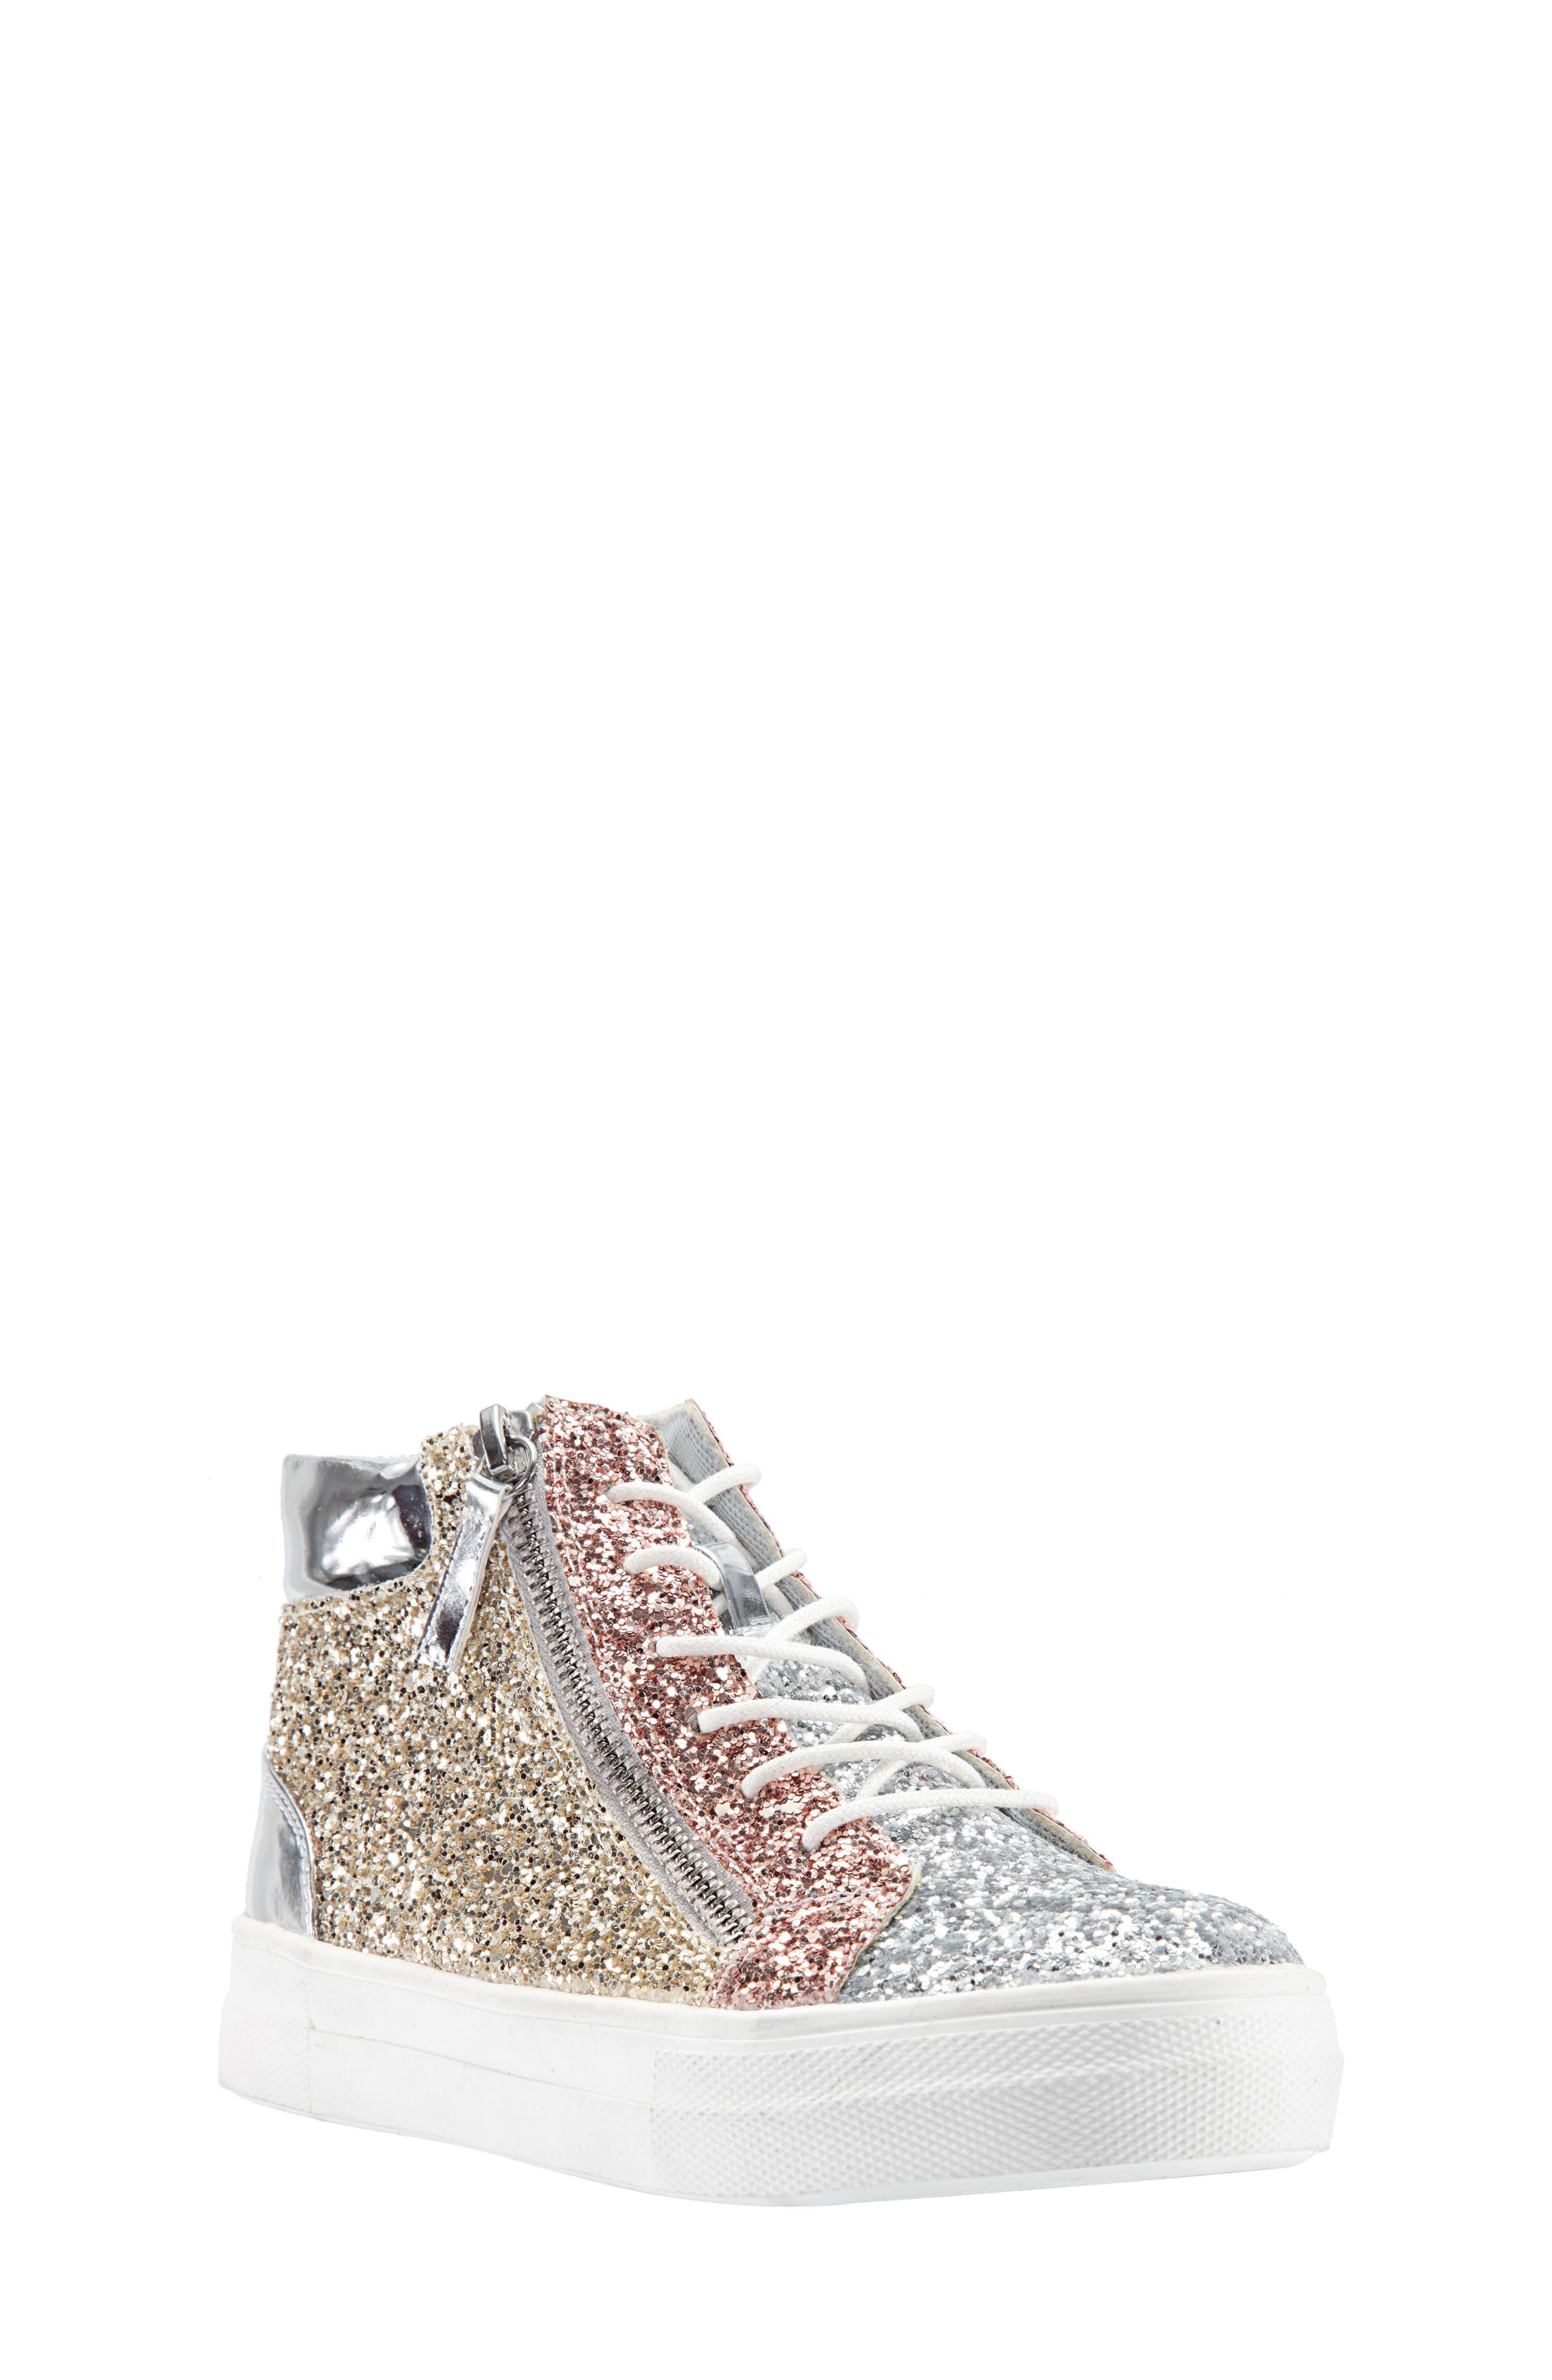 Hylda Glitter High Top Sneaker,                             Main thumbnail 1, color,                             SILVER MULTI GLITTER/ PATENT